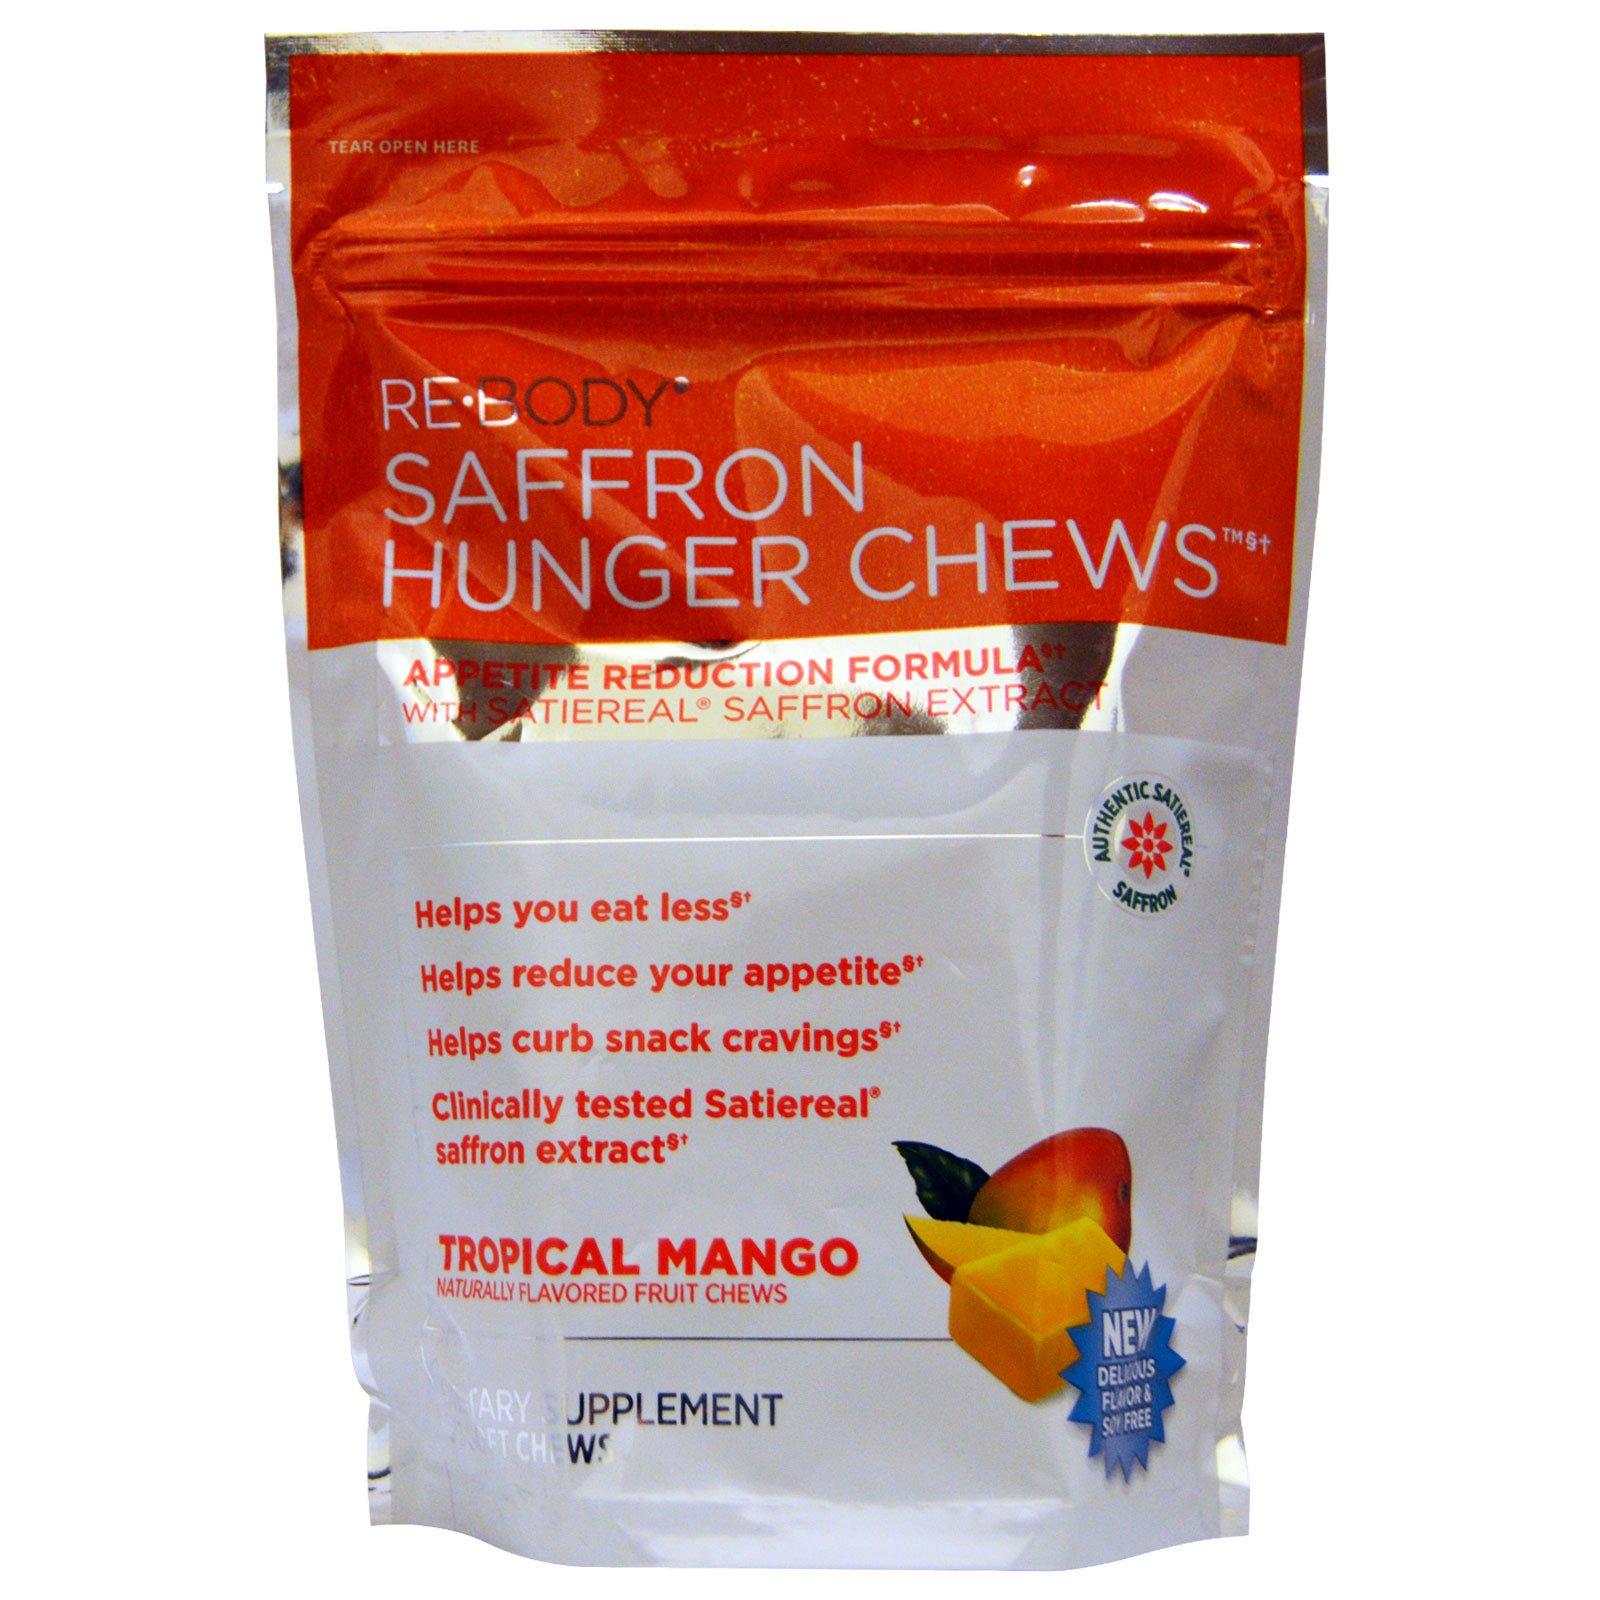 Rebody Safslim Saffron Hunger Chews Tropical Mango 30 Soft